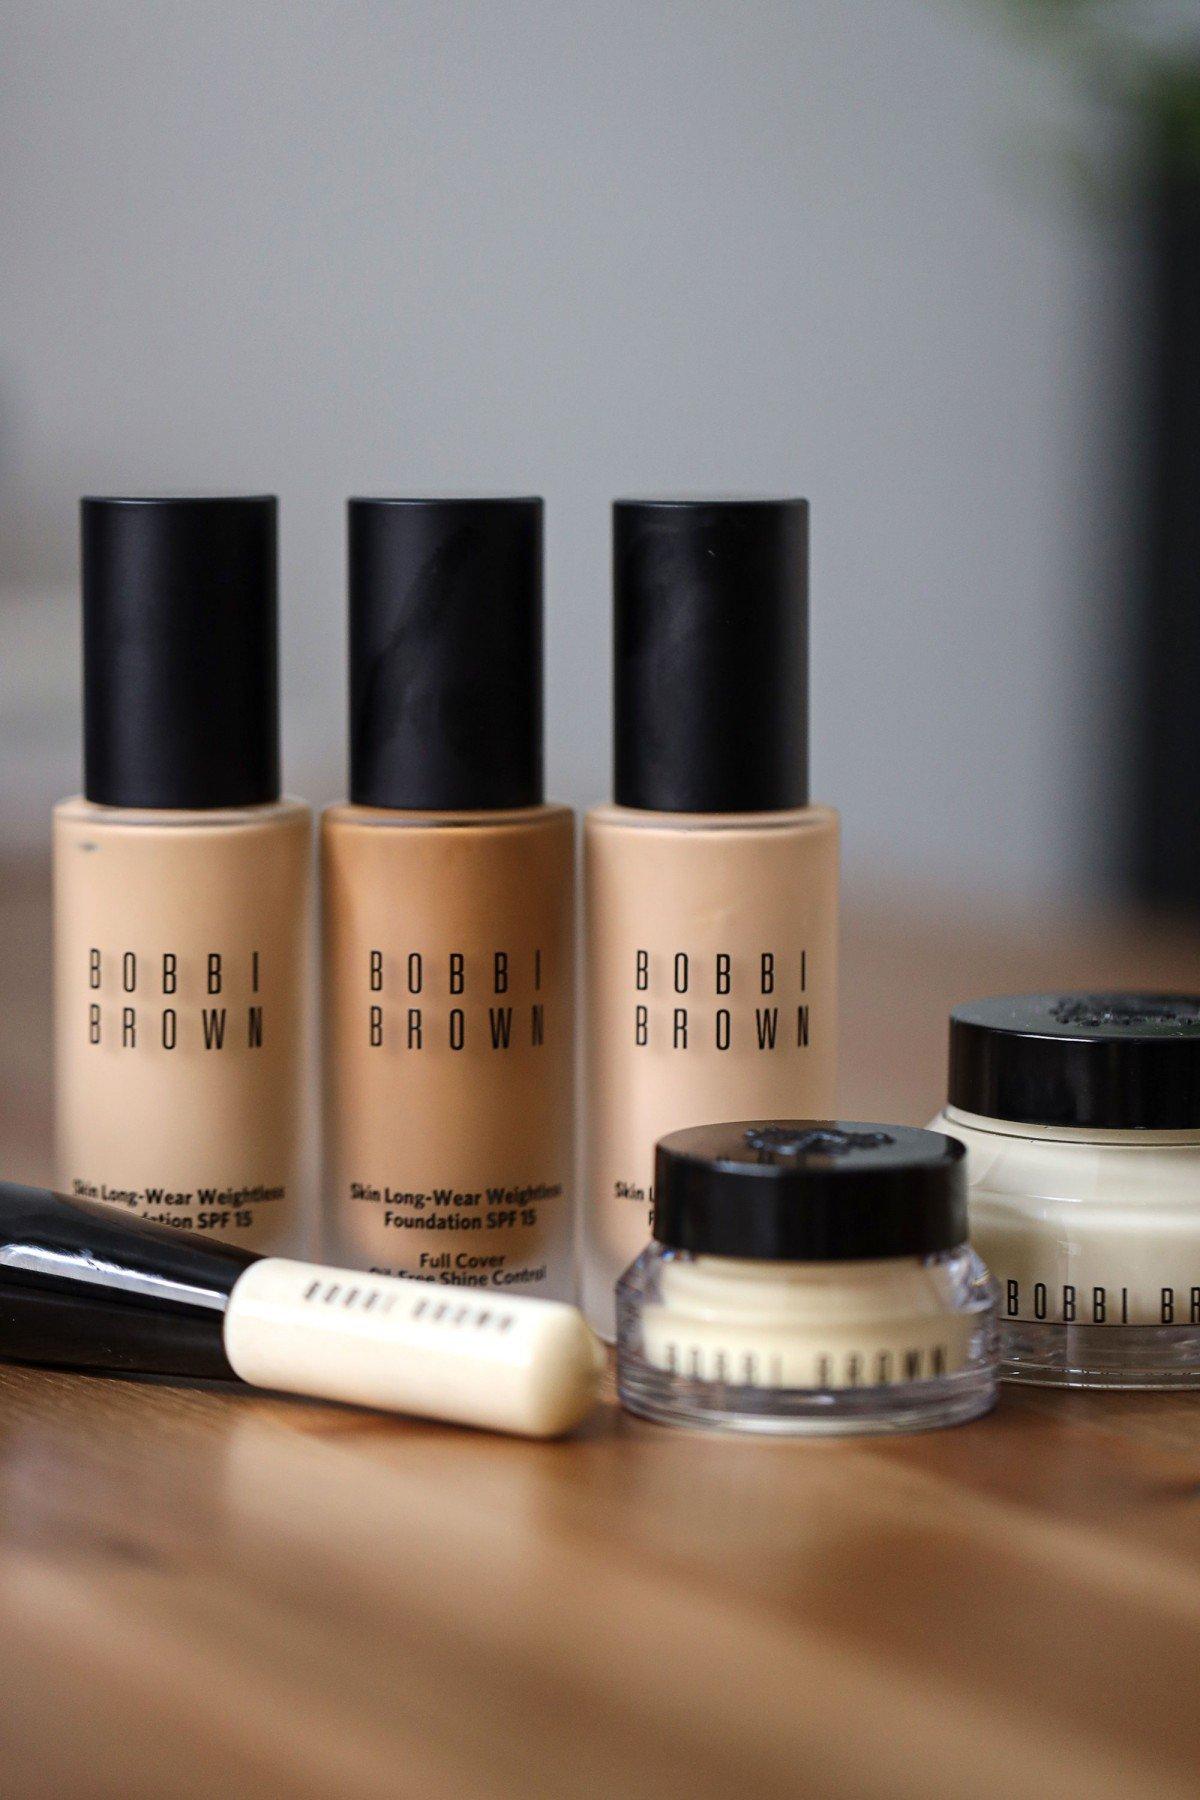 Bobbi Brown skin long-wear foundation review Serein Wu